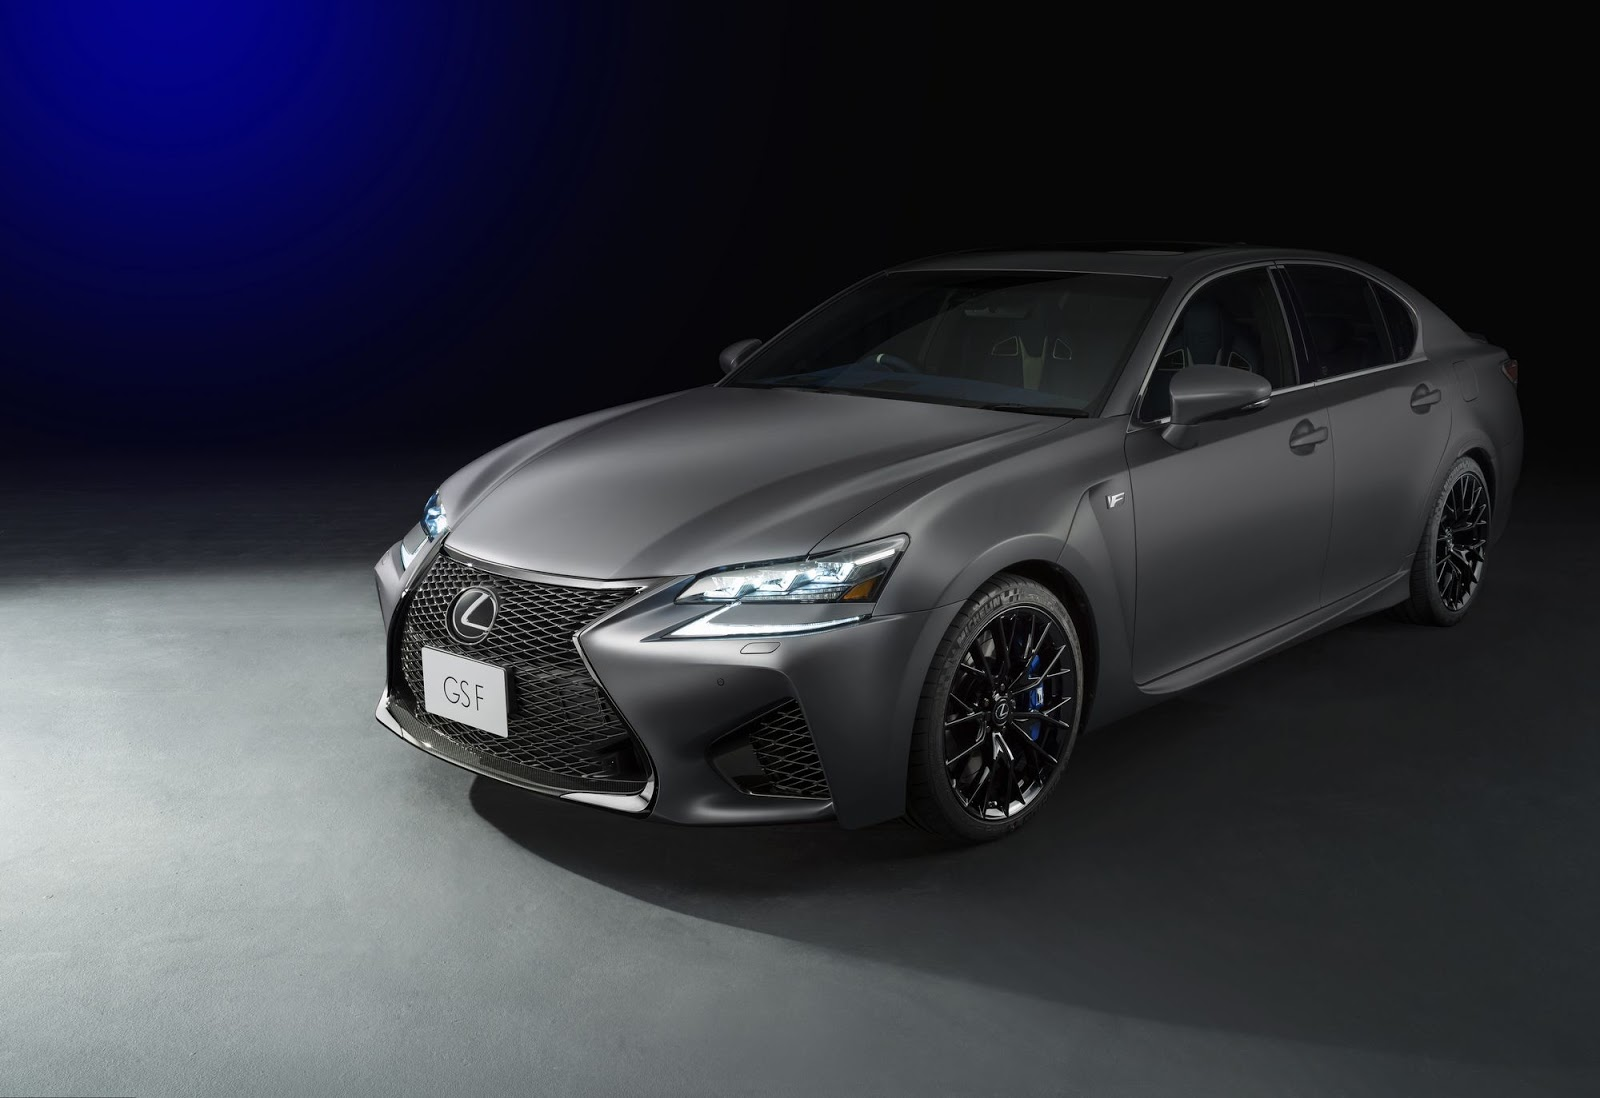 Lexus-RC-F-GS-F-Tokyo-13